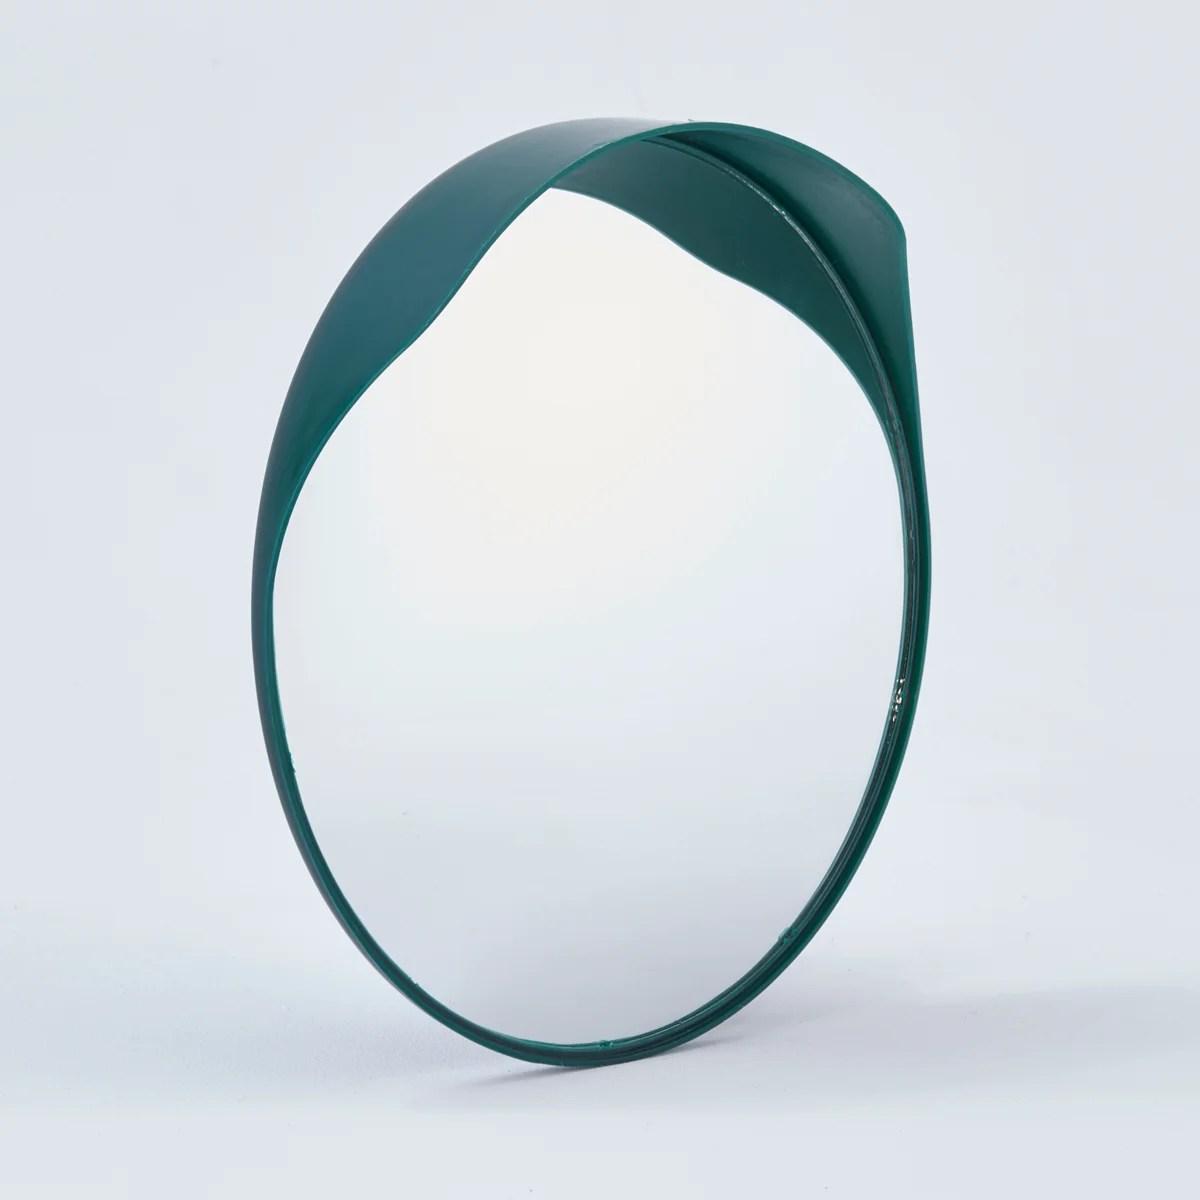 Miroir De Sortie Convexe Diam 30 Cm Distance De Vision De 3 M Leroy Merlin